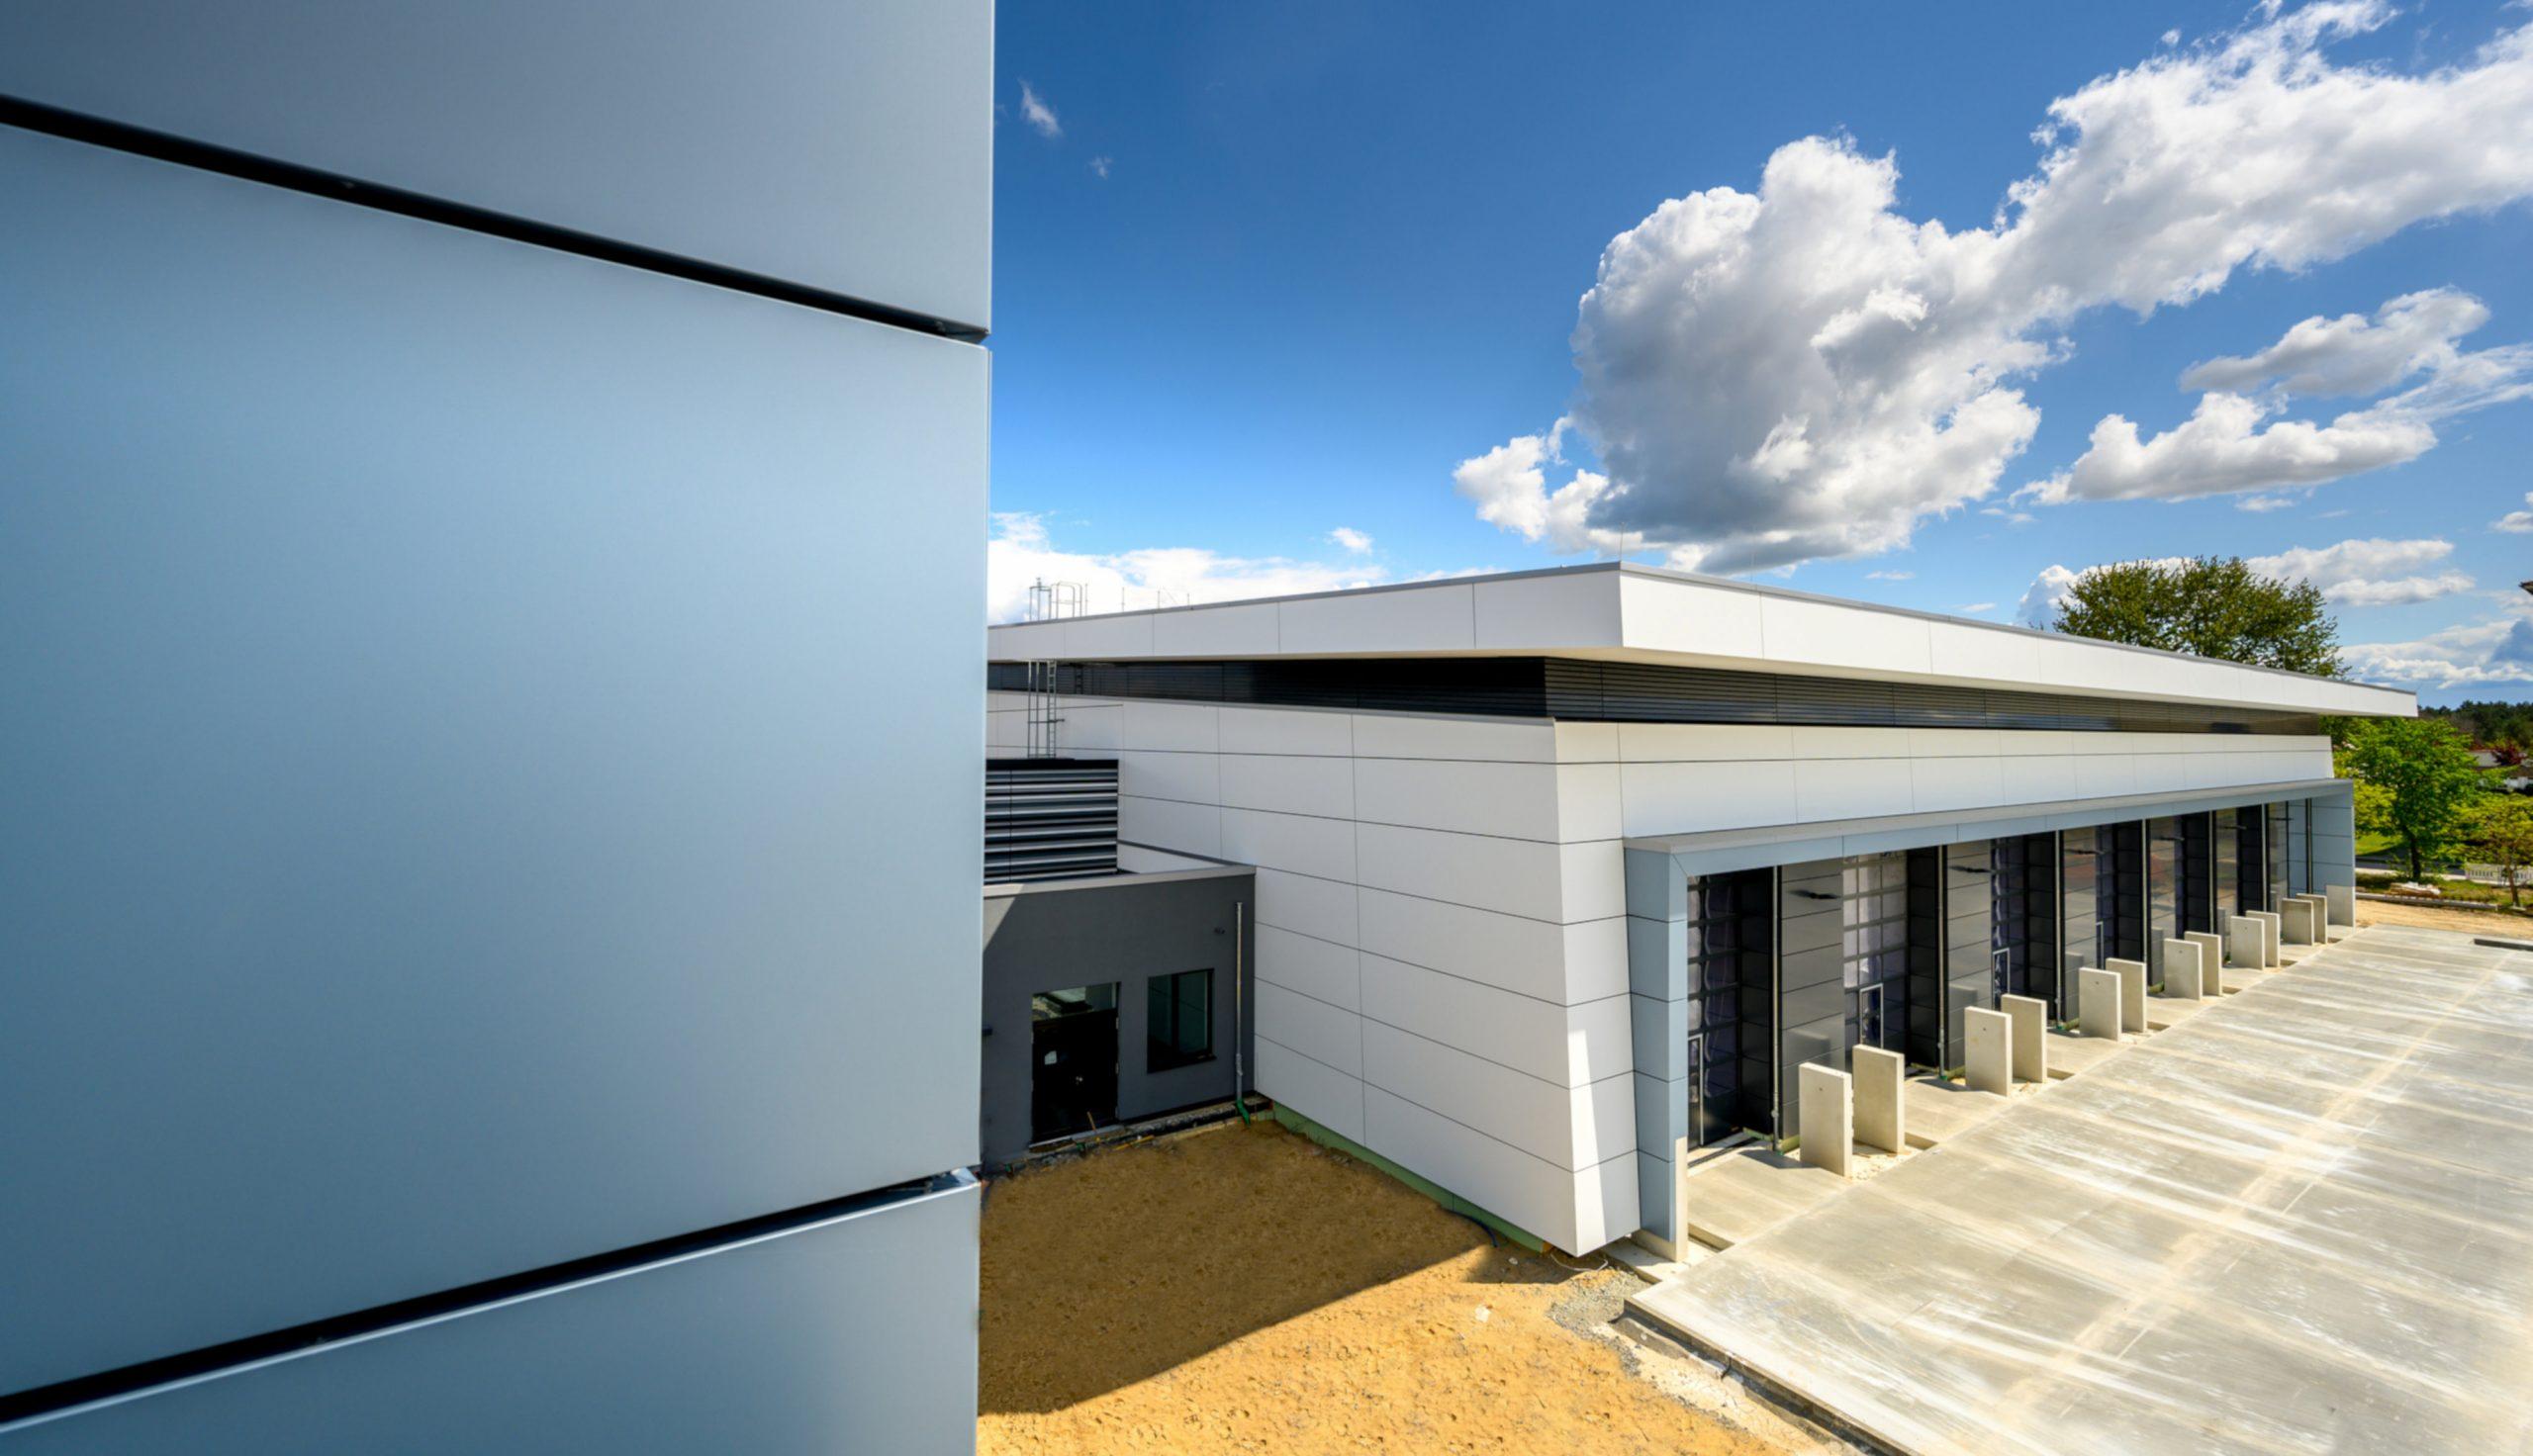 Projektbild 4, Kfz Instandsetzungshalle |  |  H.-J. Zieten Kaserne Beelitz